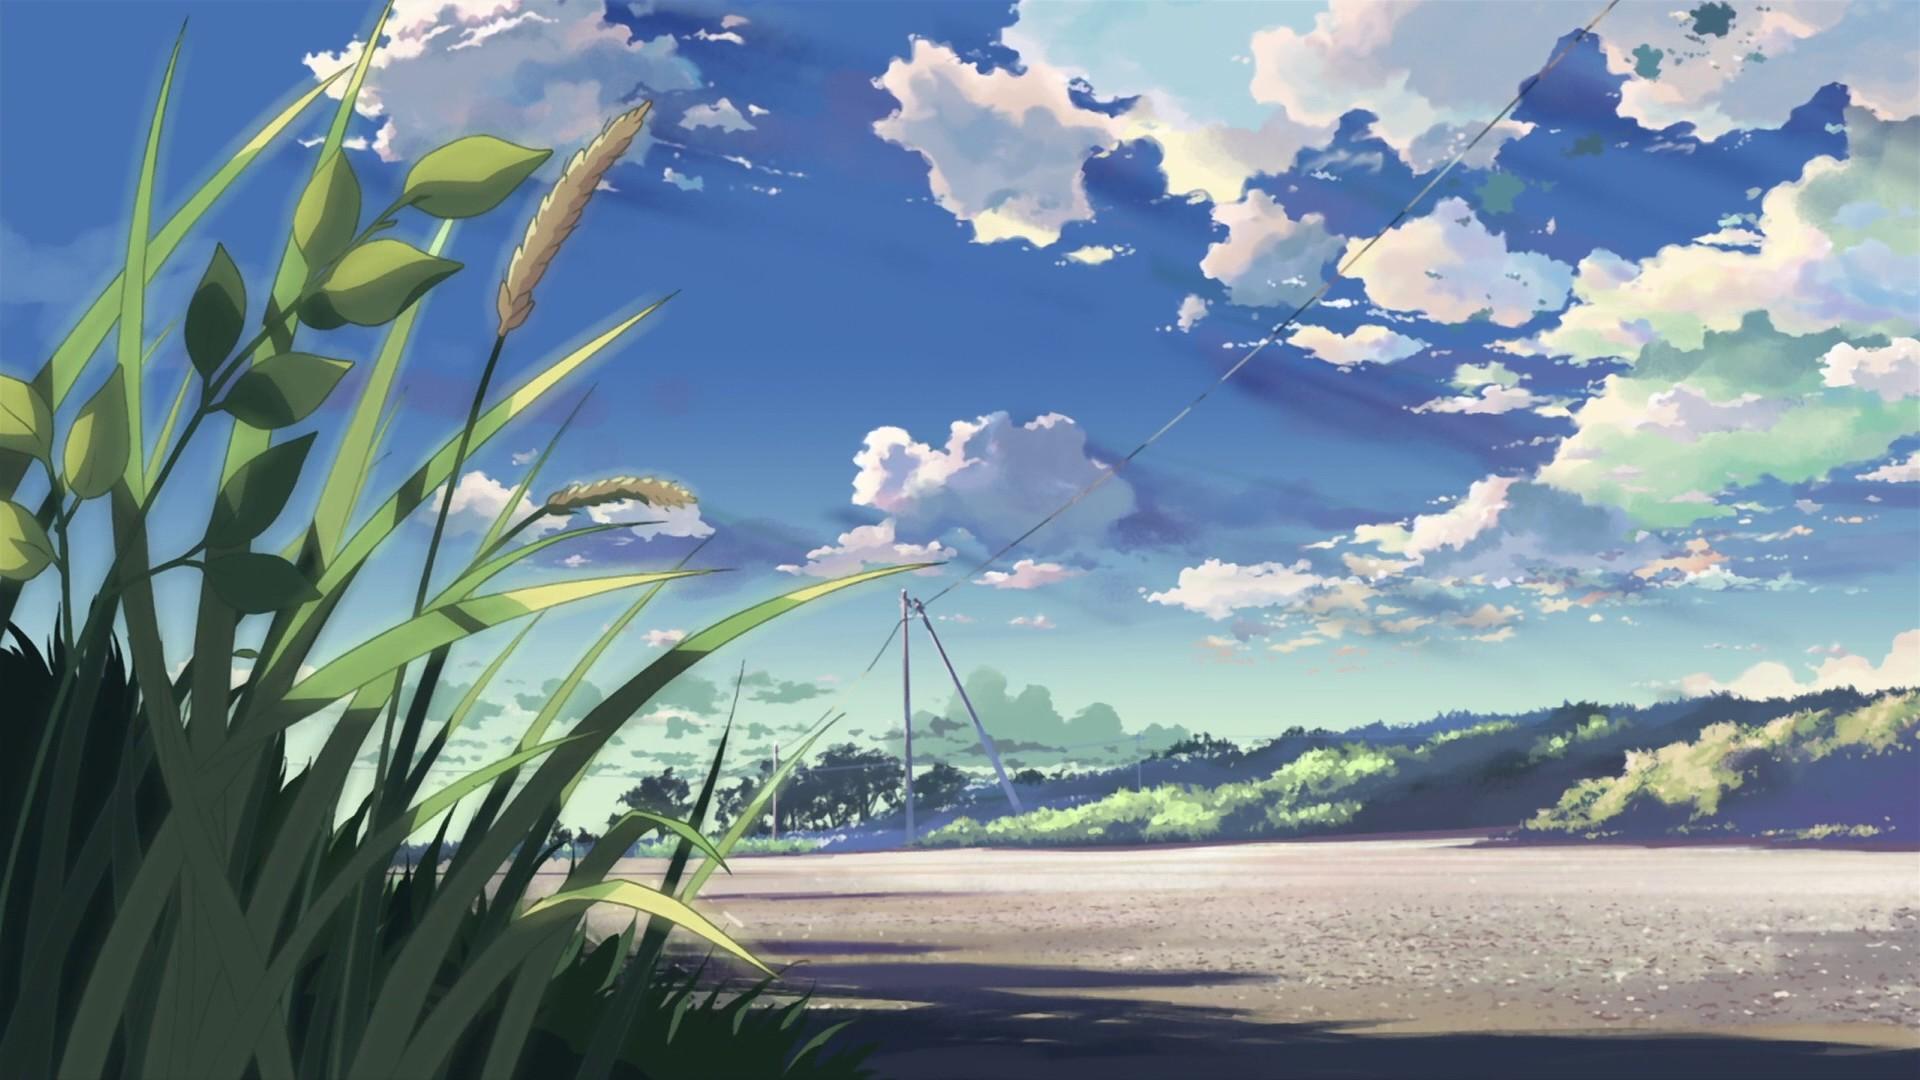 Res: 1920x1080, Anime Landscape Wallpaper HD.